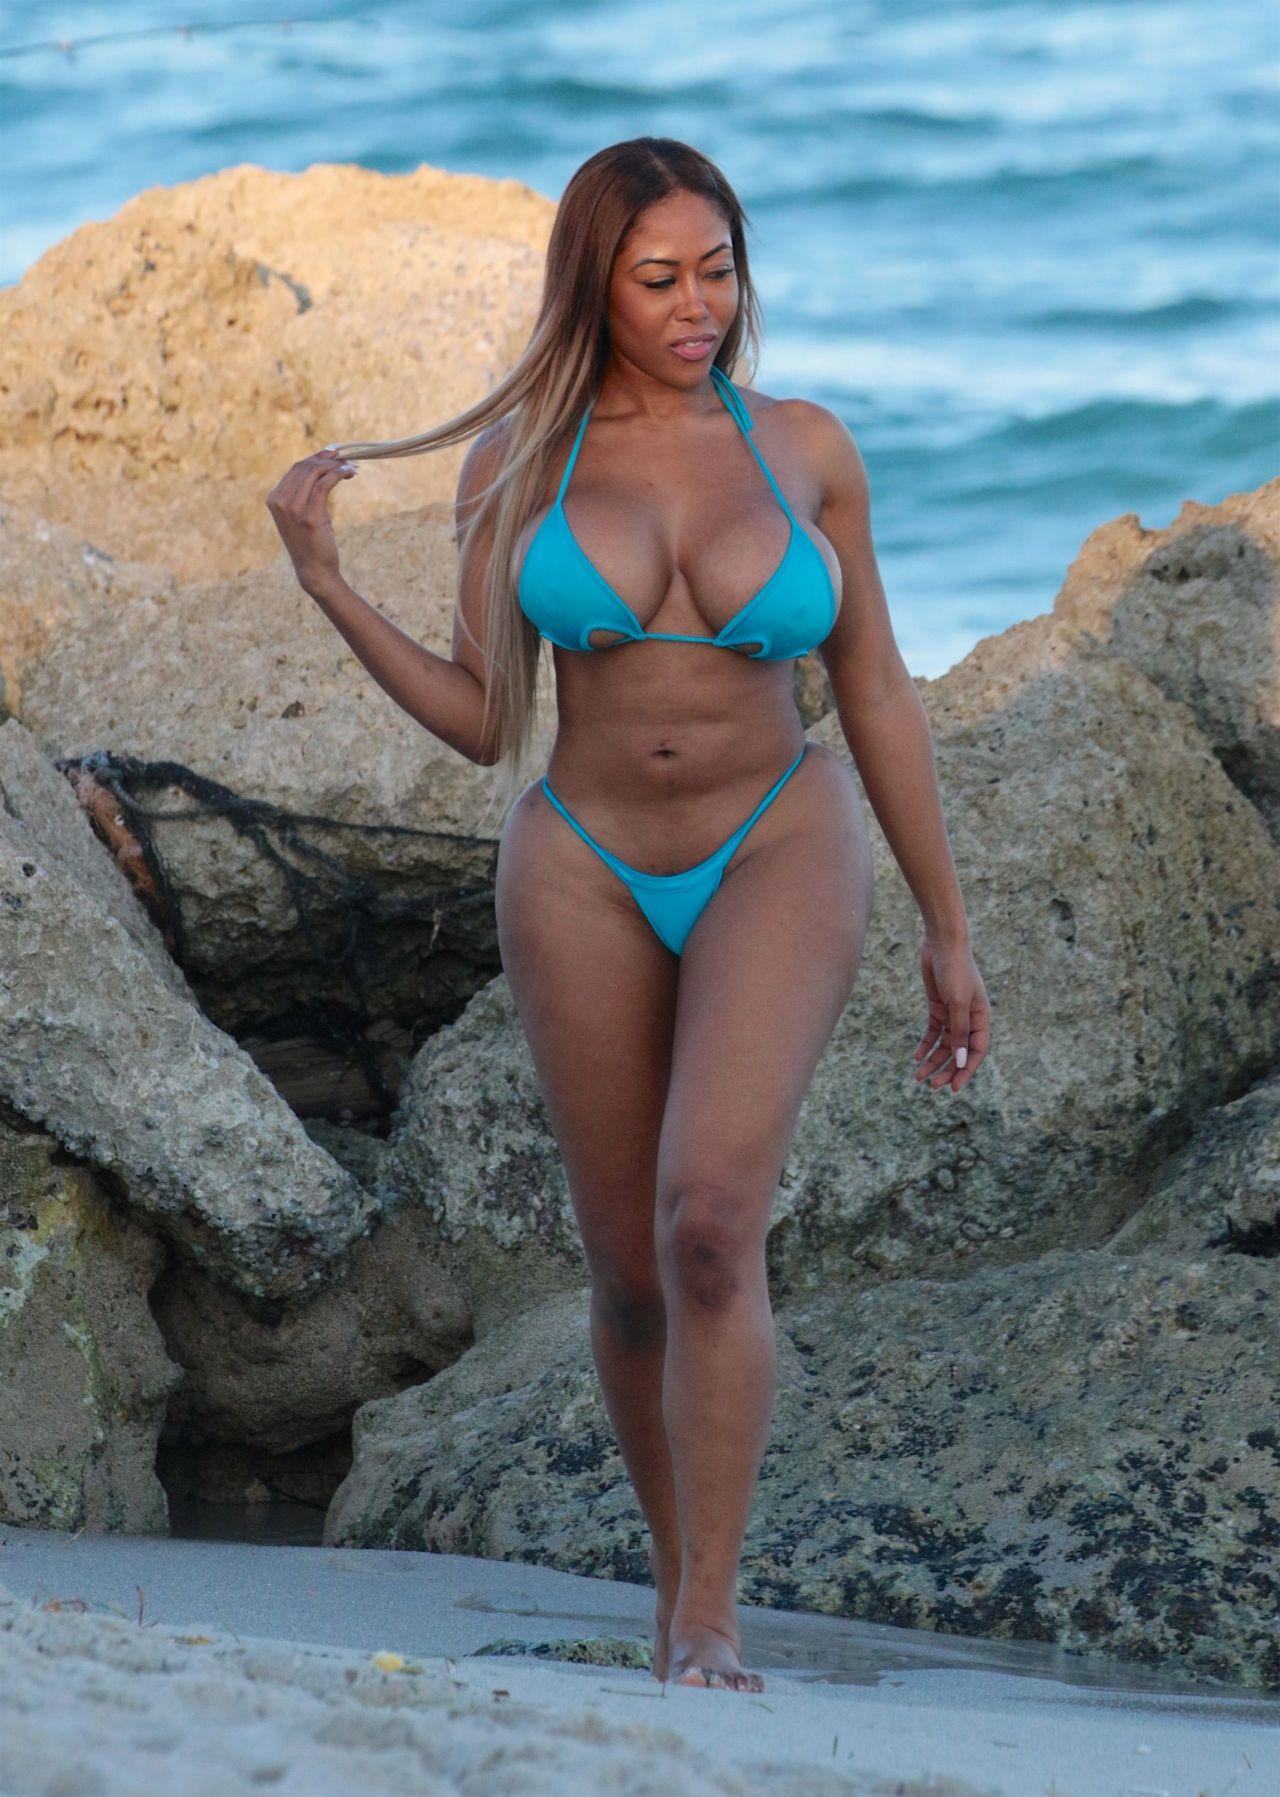 Moriah Mills in Bikini Photoshoot on the beach in Miami Pic 22 of 35